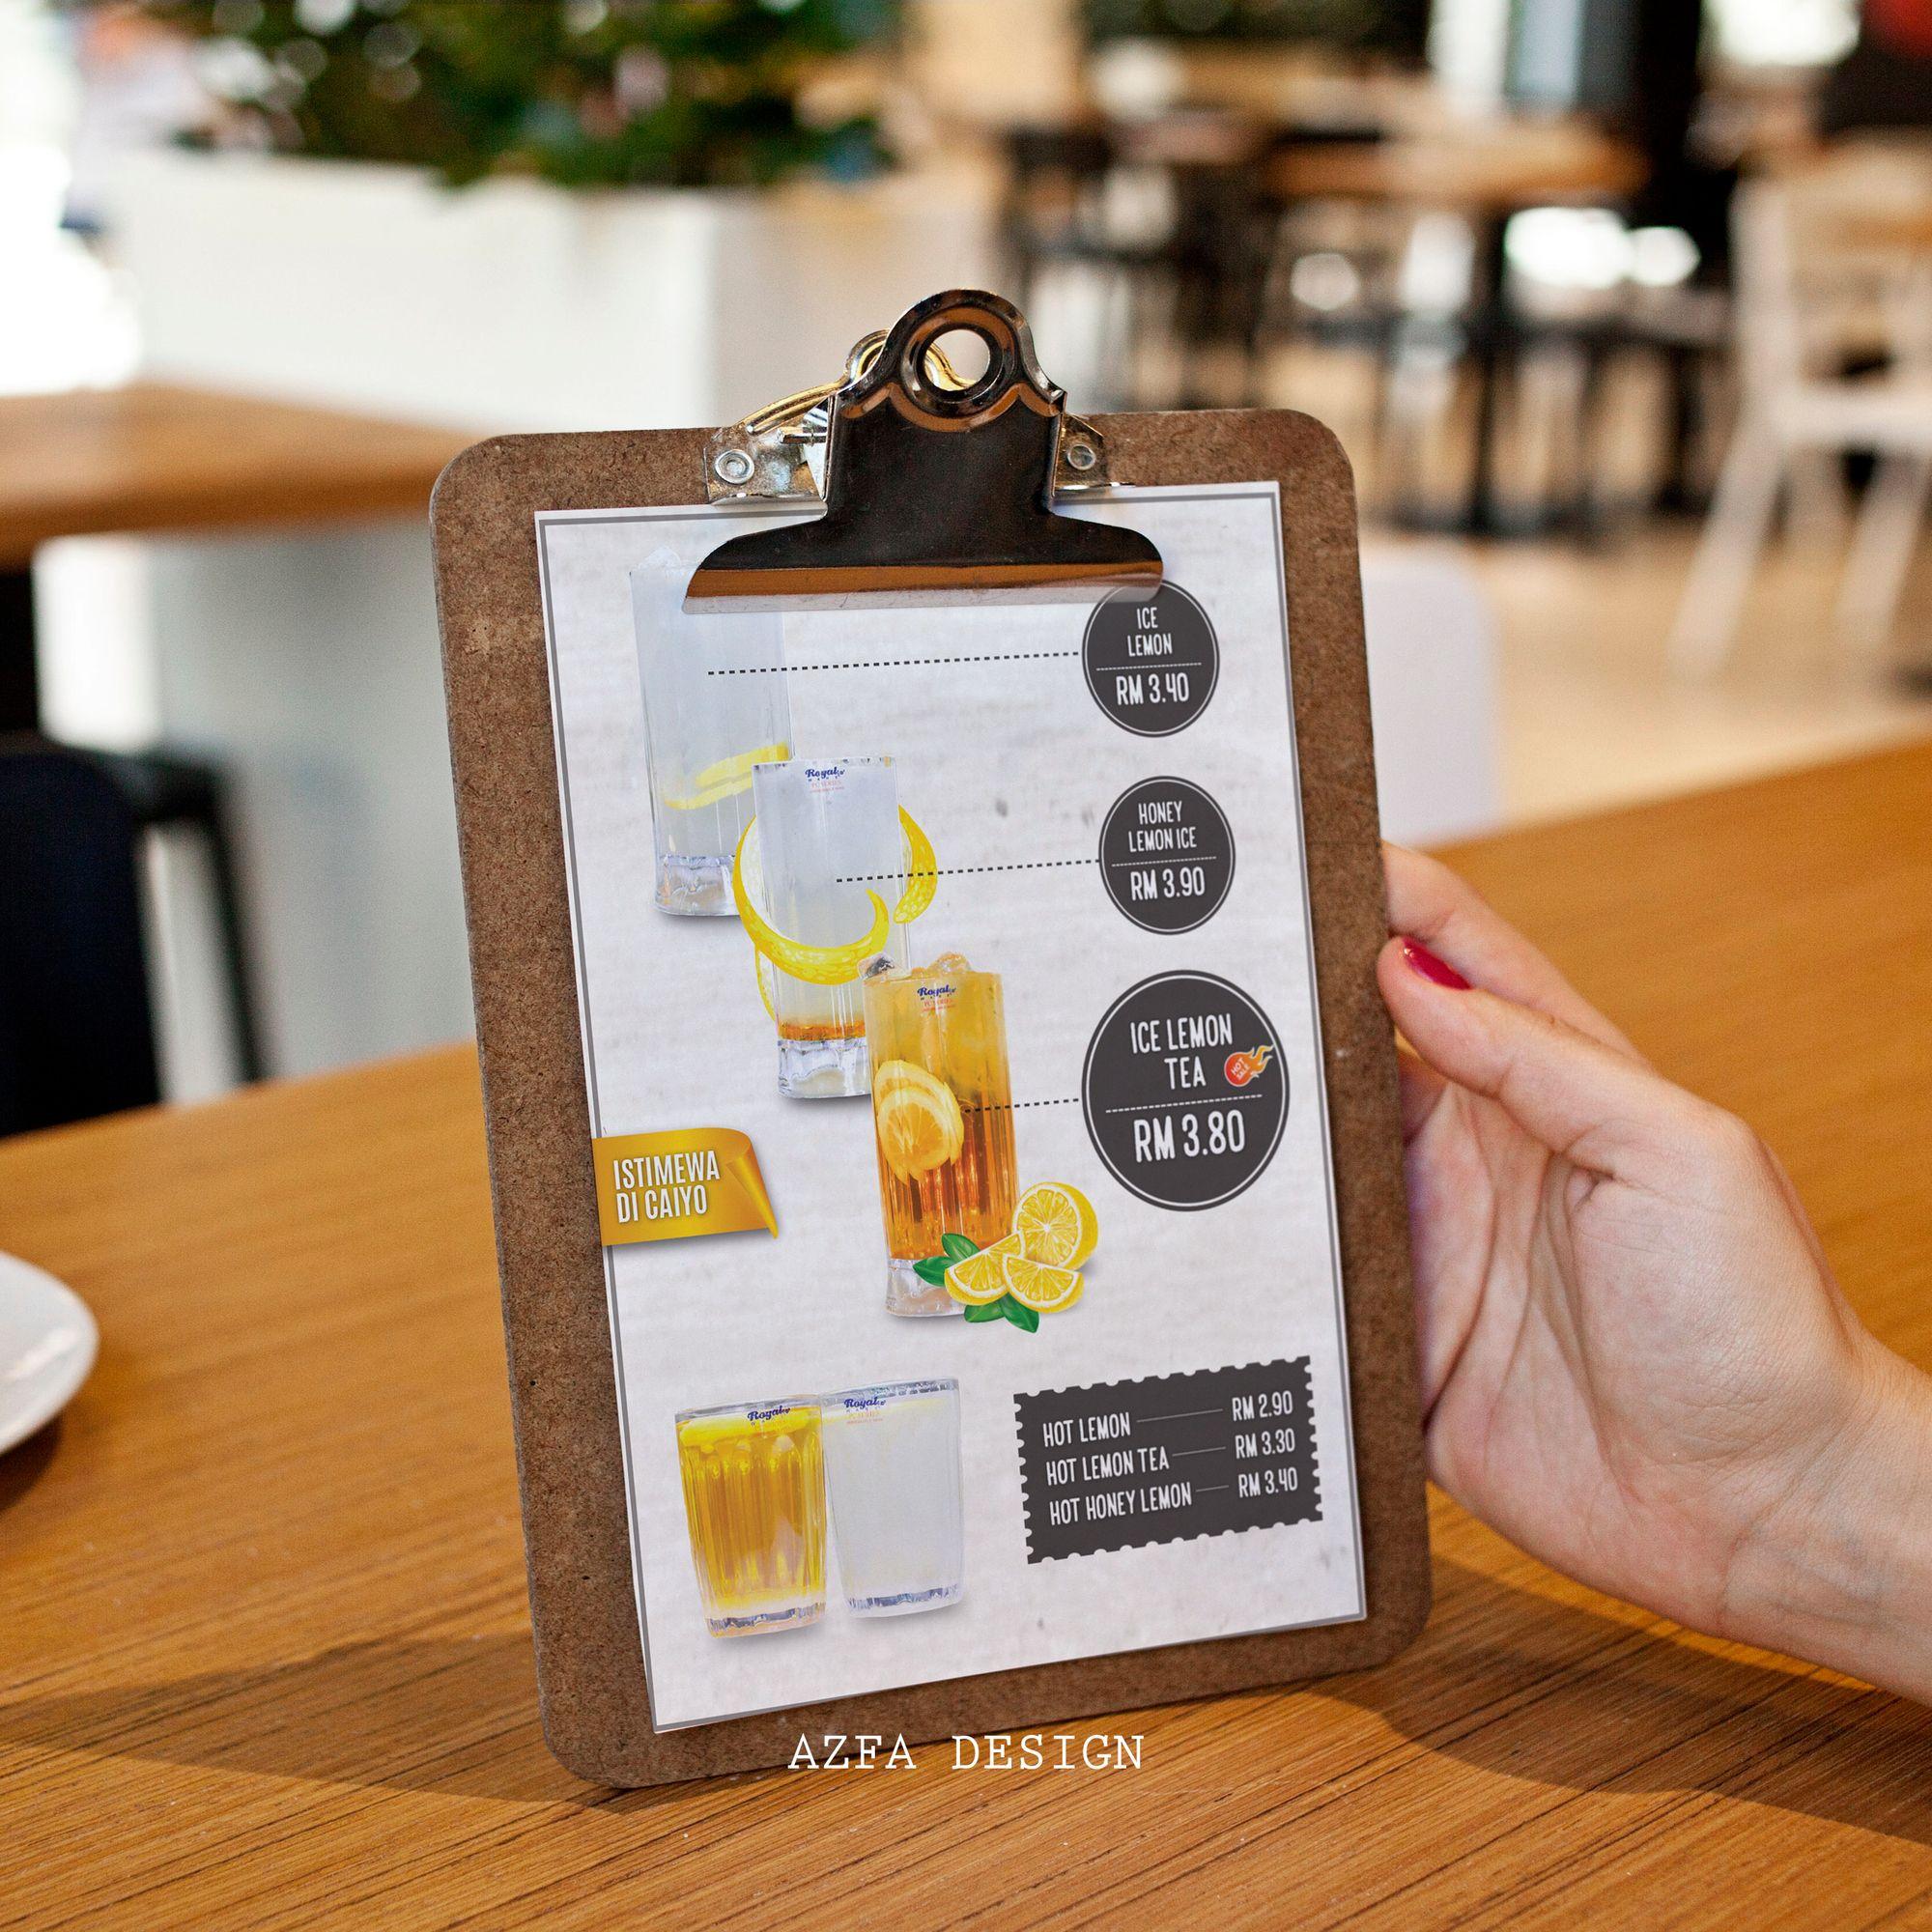 Azfadesign Menubook Updating Your Menu Books With Azfa Design Printing You Already In 2020 Menu Book New Menu Cool Designs